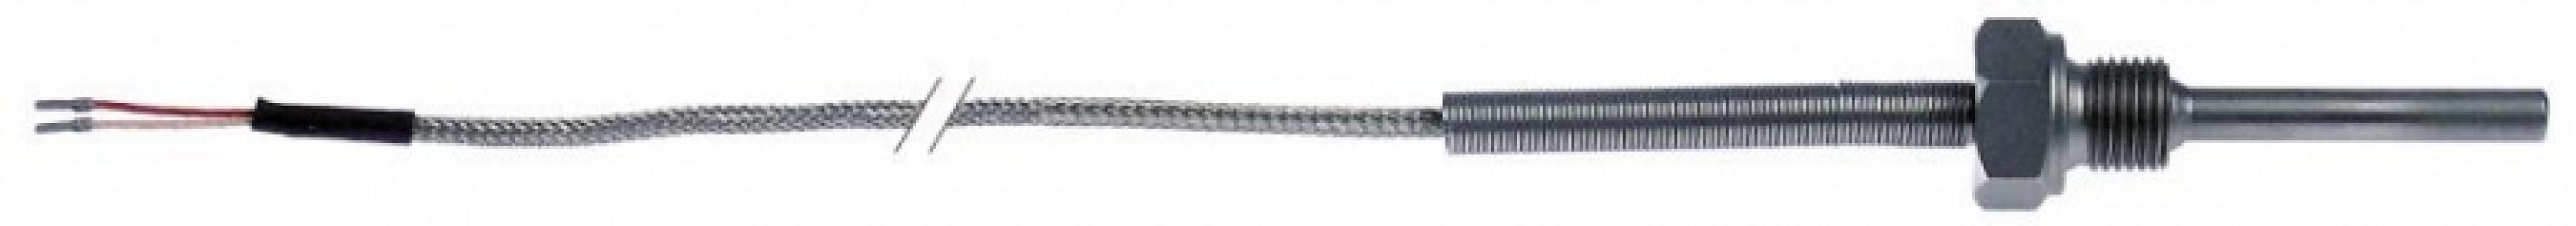 Sonda temperatura Pt100 Vetrotex